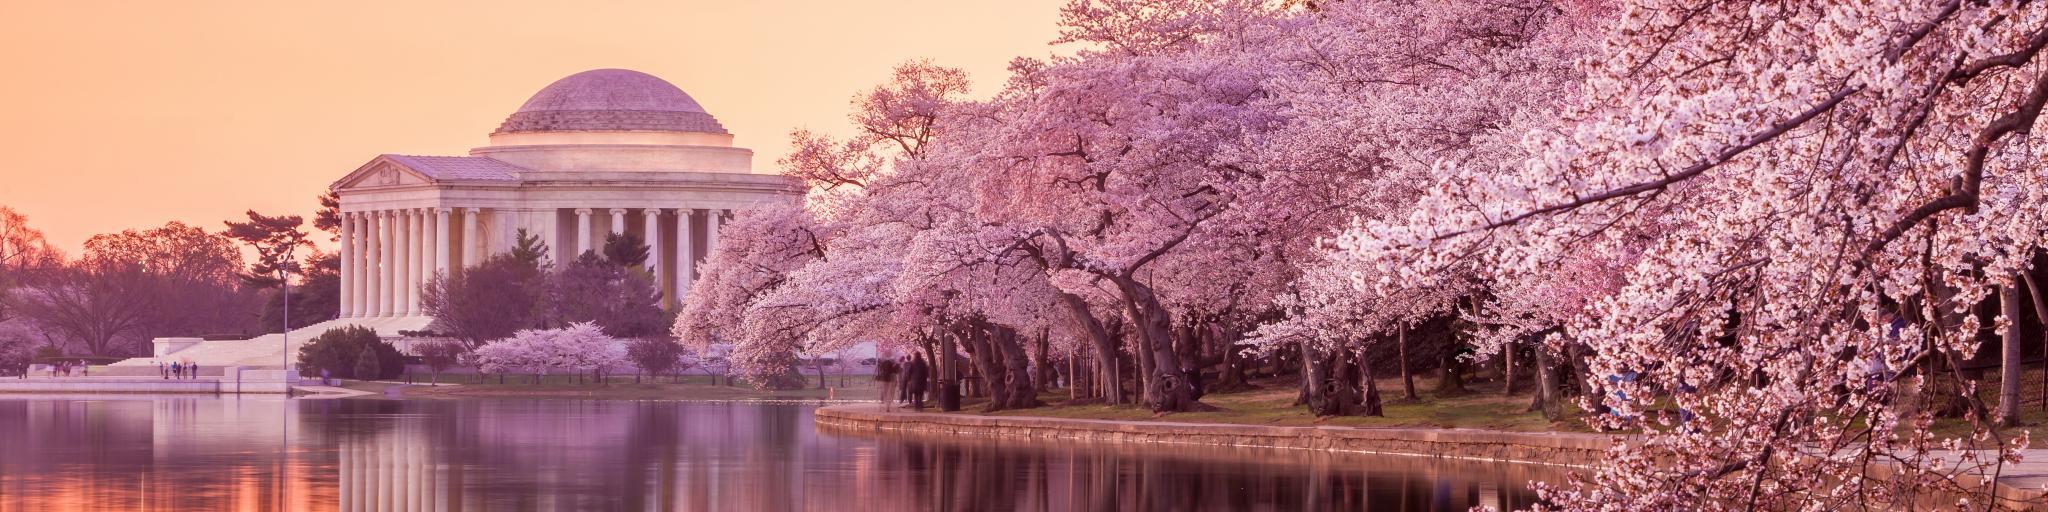 Jefferson Memorial during the Cherry Blossom Festival. Washington DC